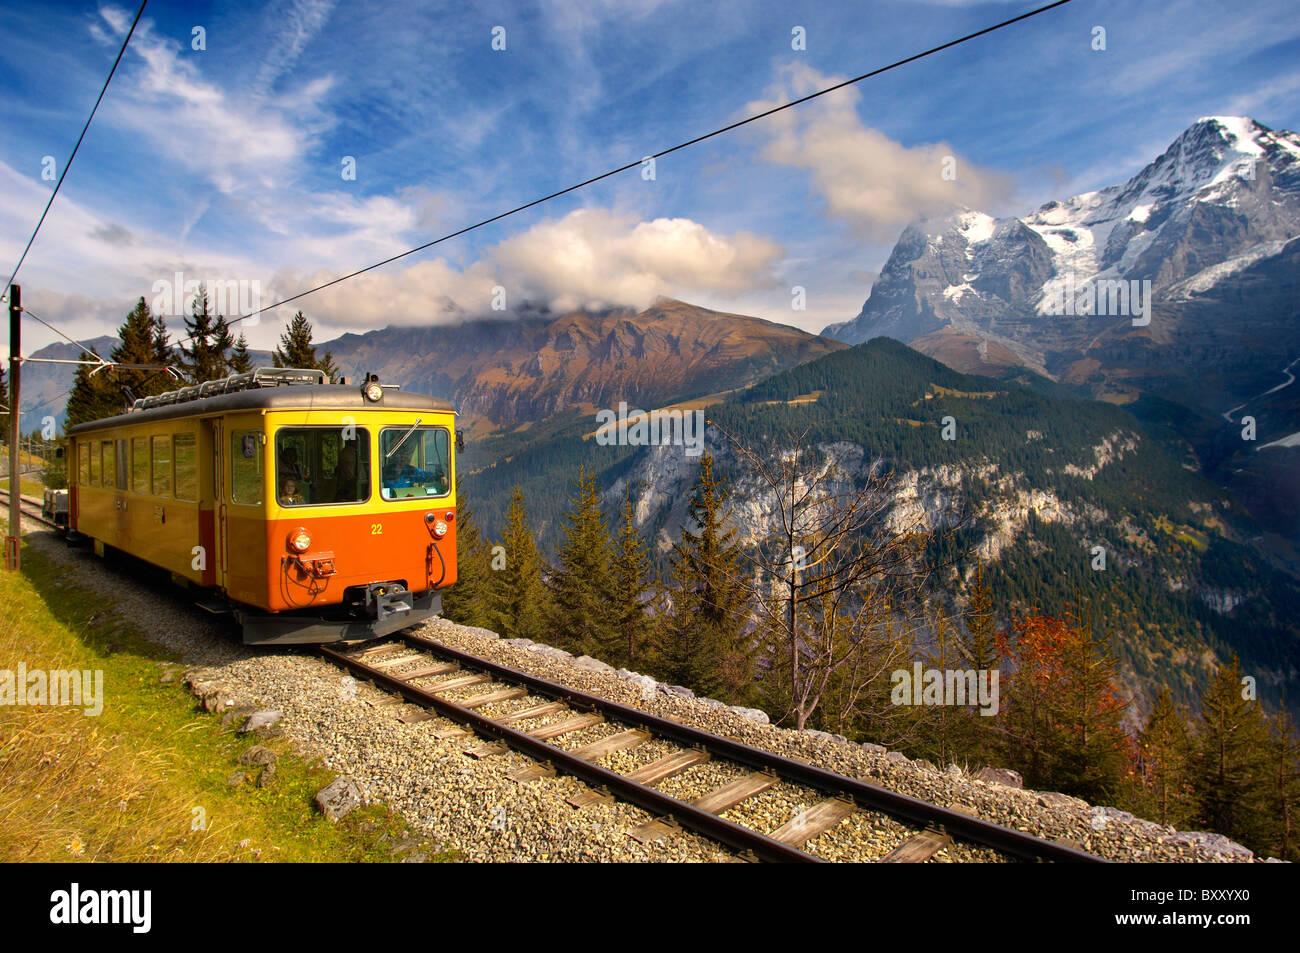 Murren fenicular Train - Switzerland - Stock Image